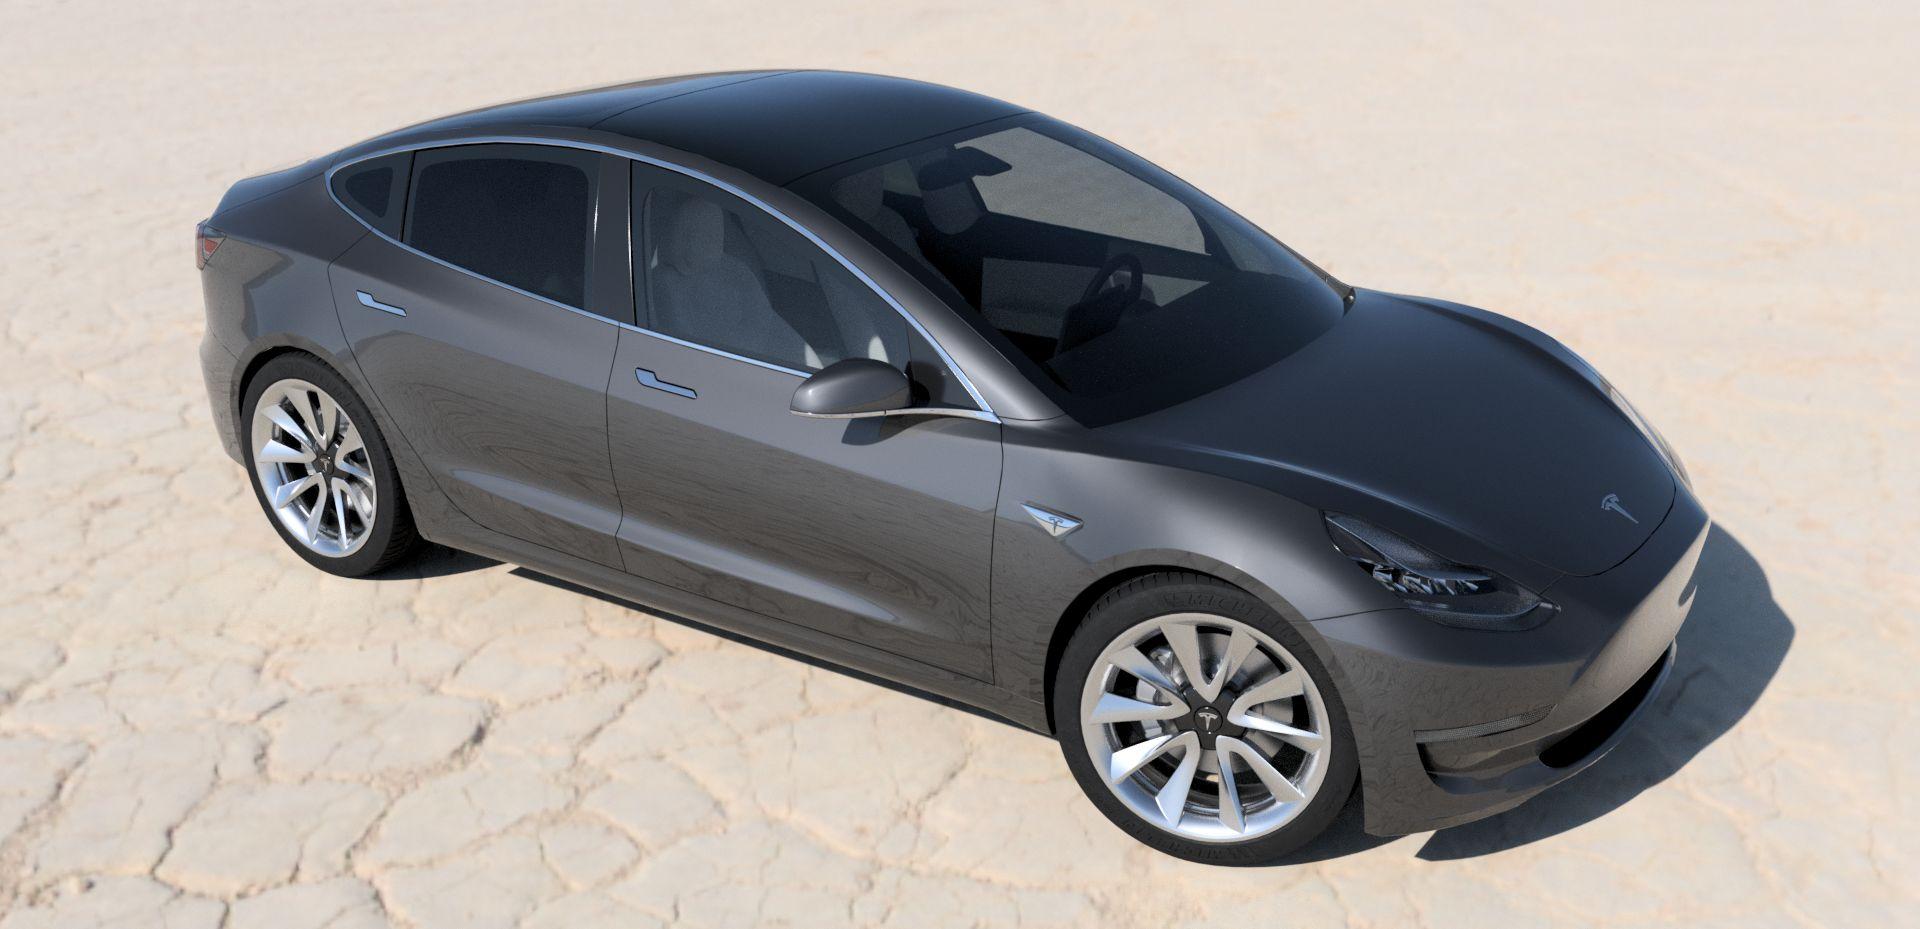 Tesla03ufq01-3500-3500